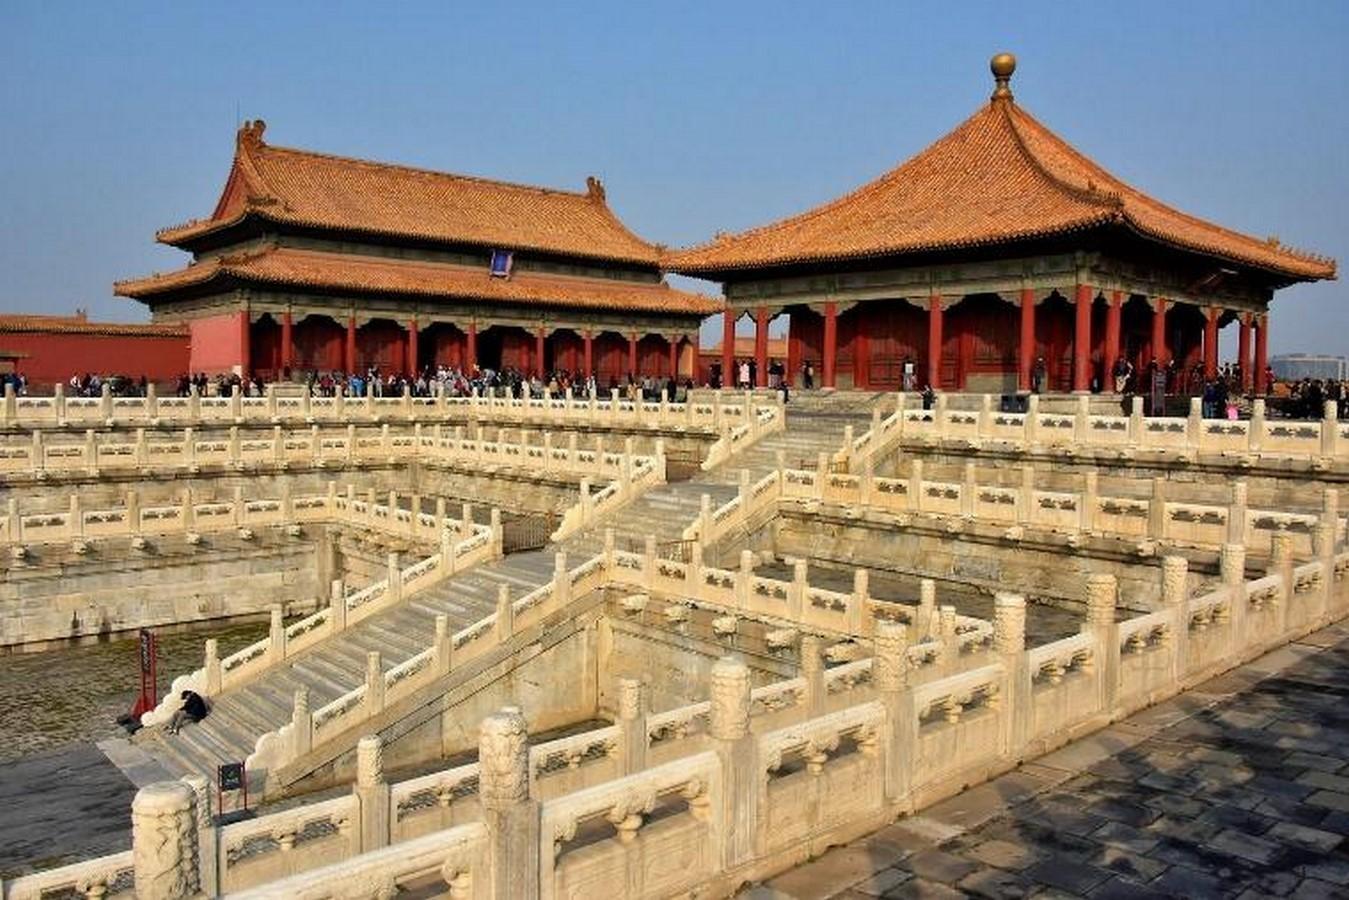 The Forbidden City, China - Sheet1